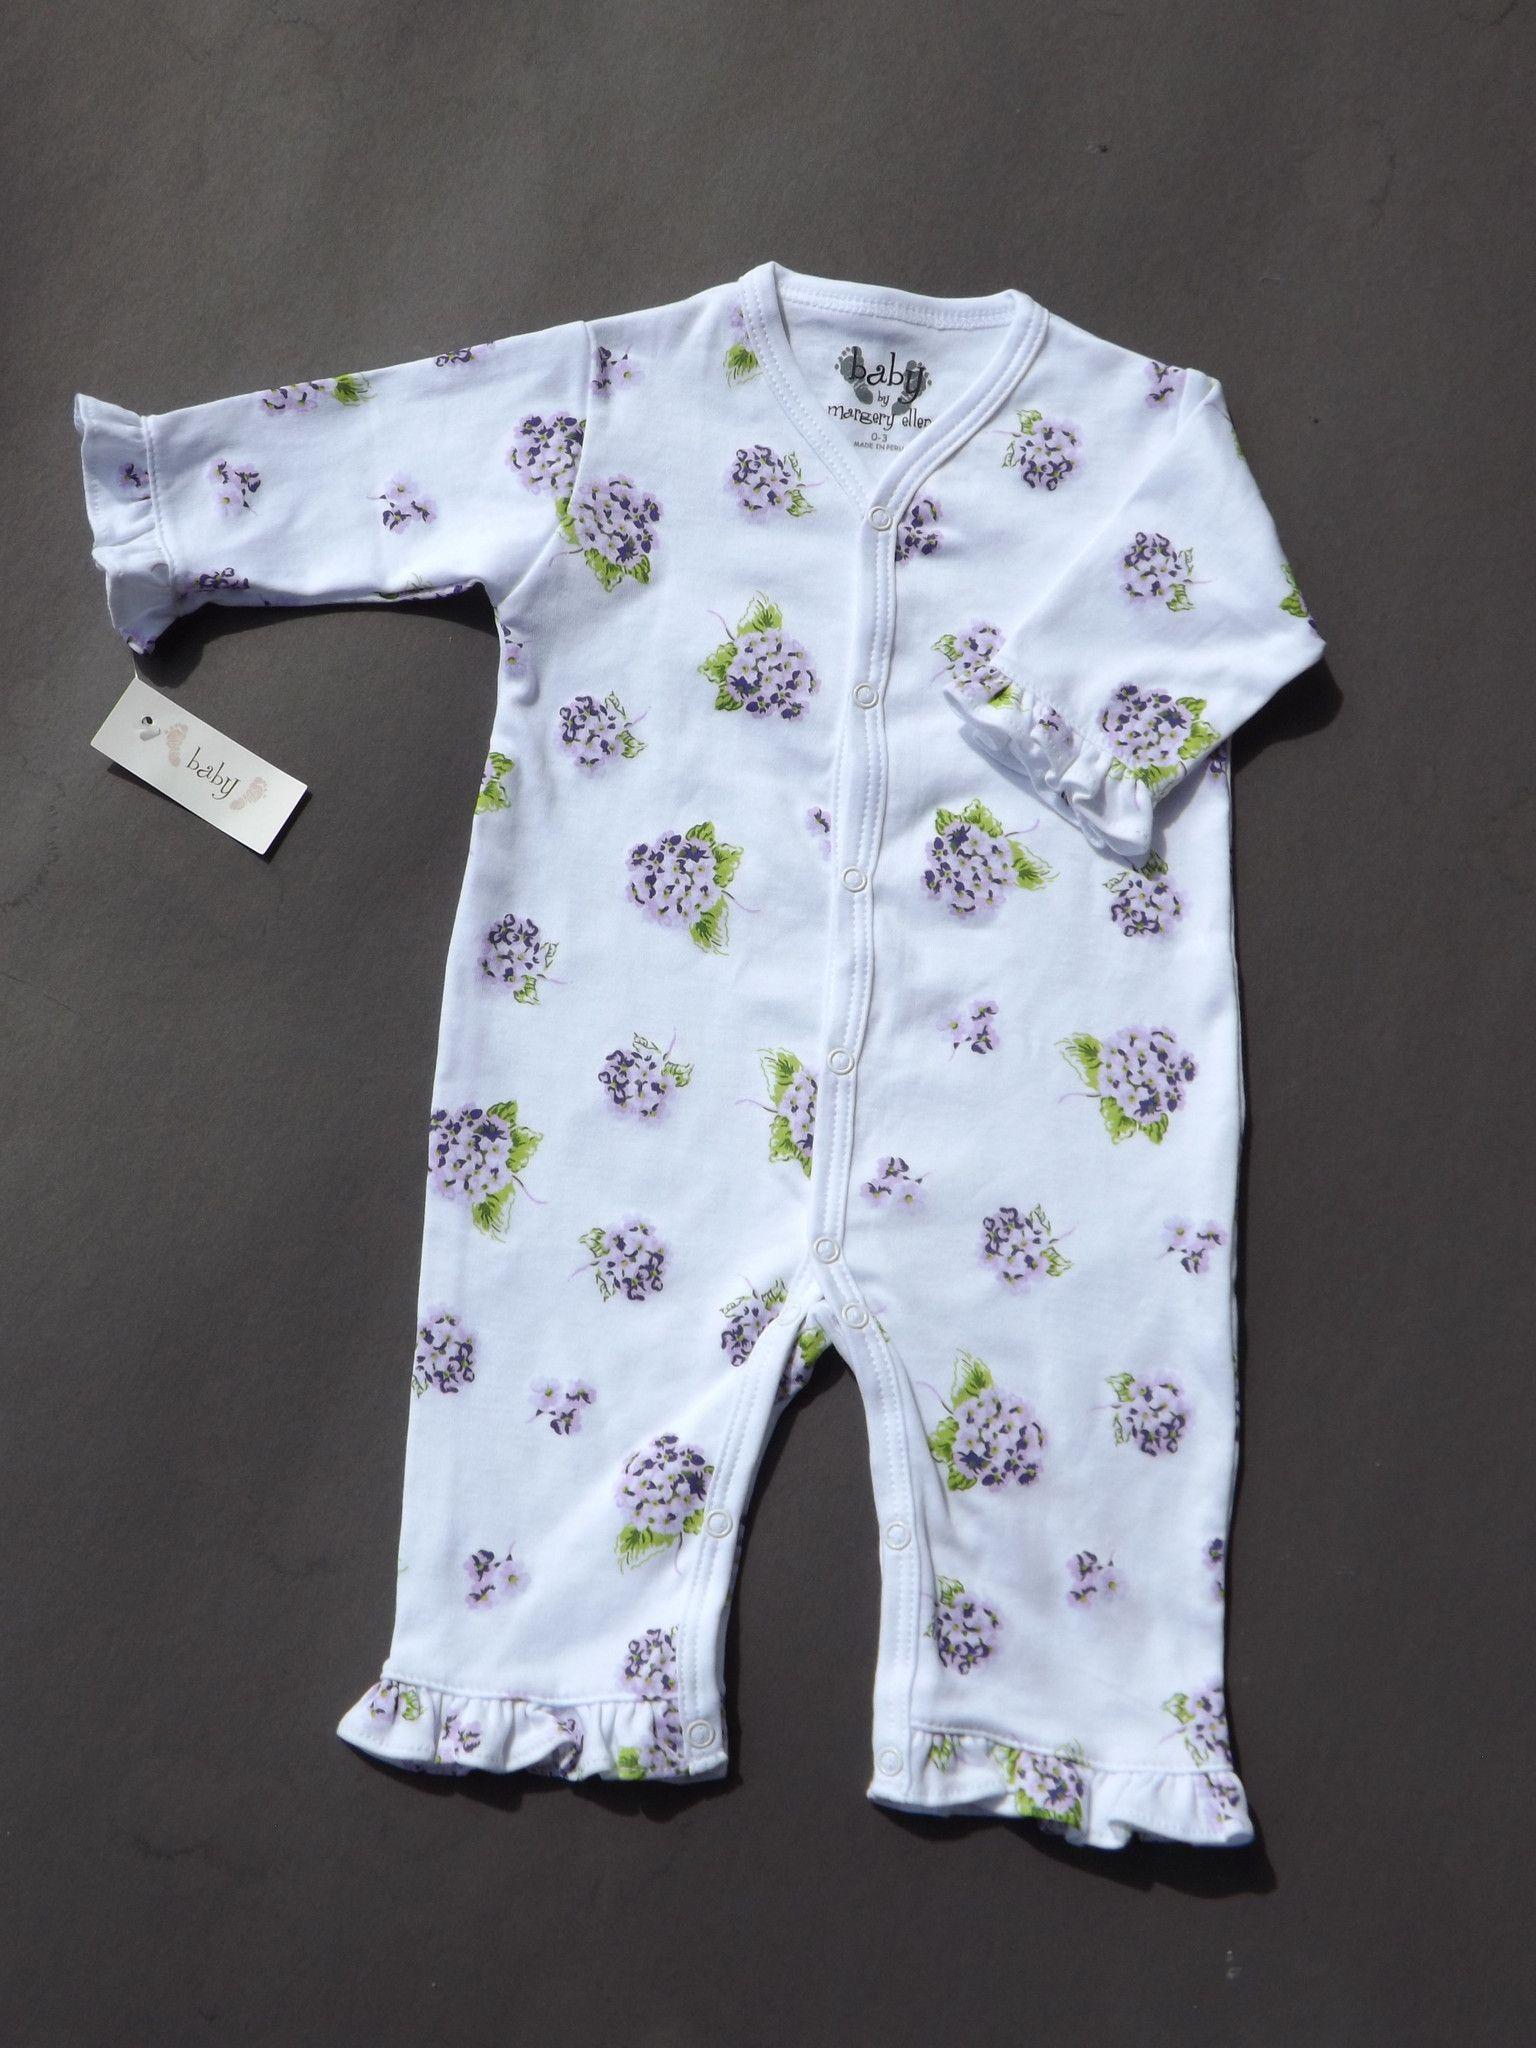 Darling ruffled hydrangeas romper for newborn baby girl. Sizes 5-5